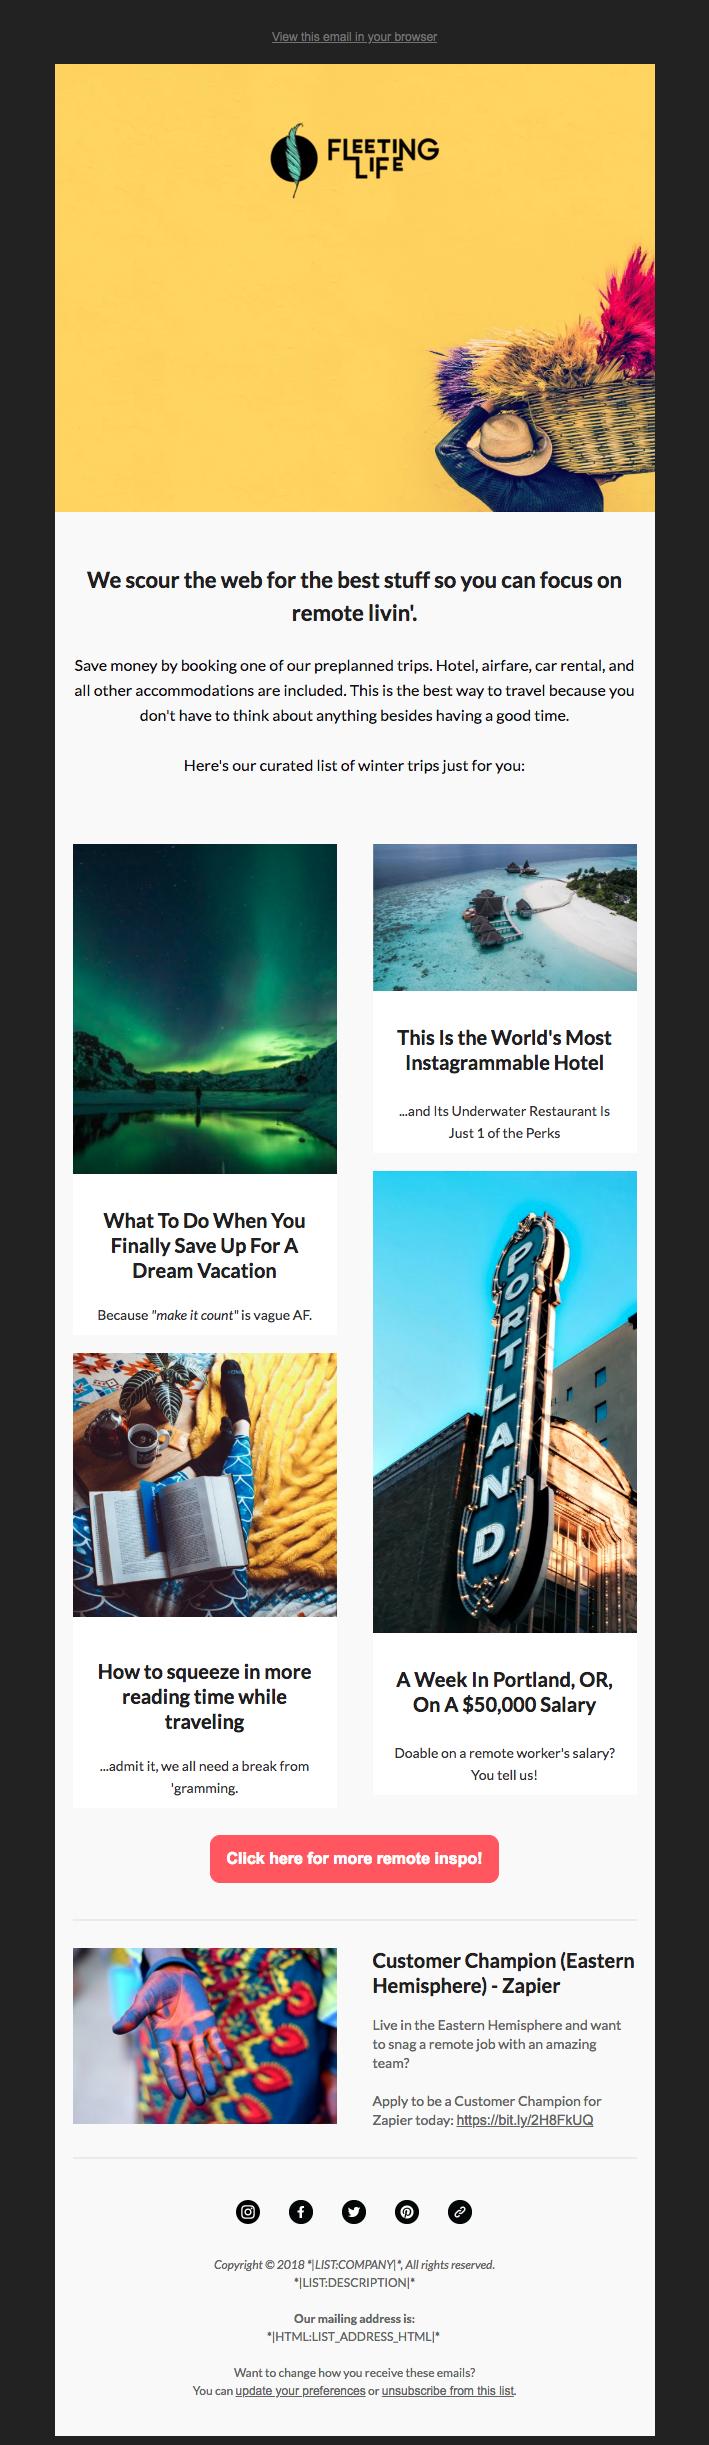 FL newsletter template (1).png